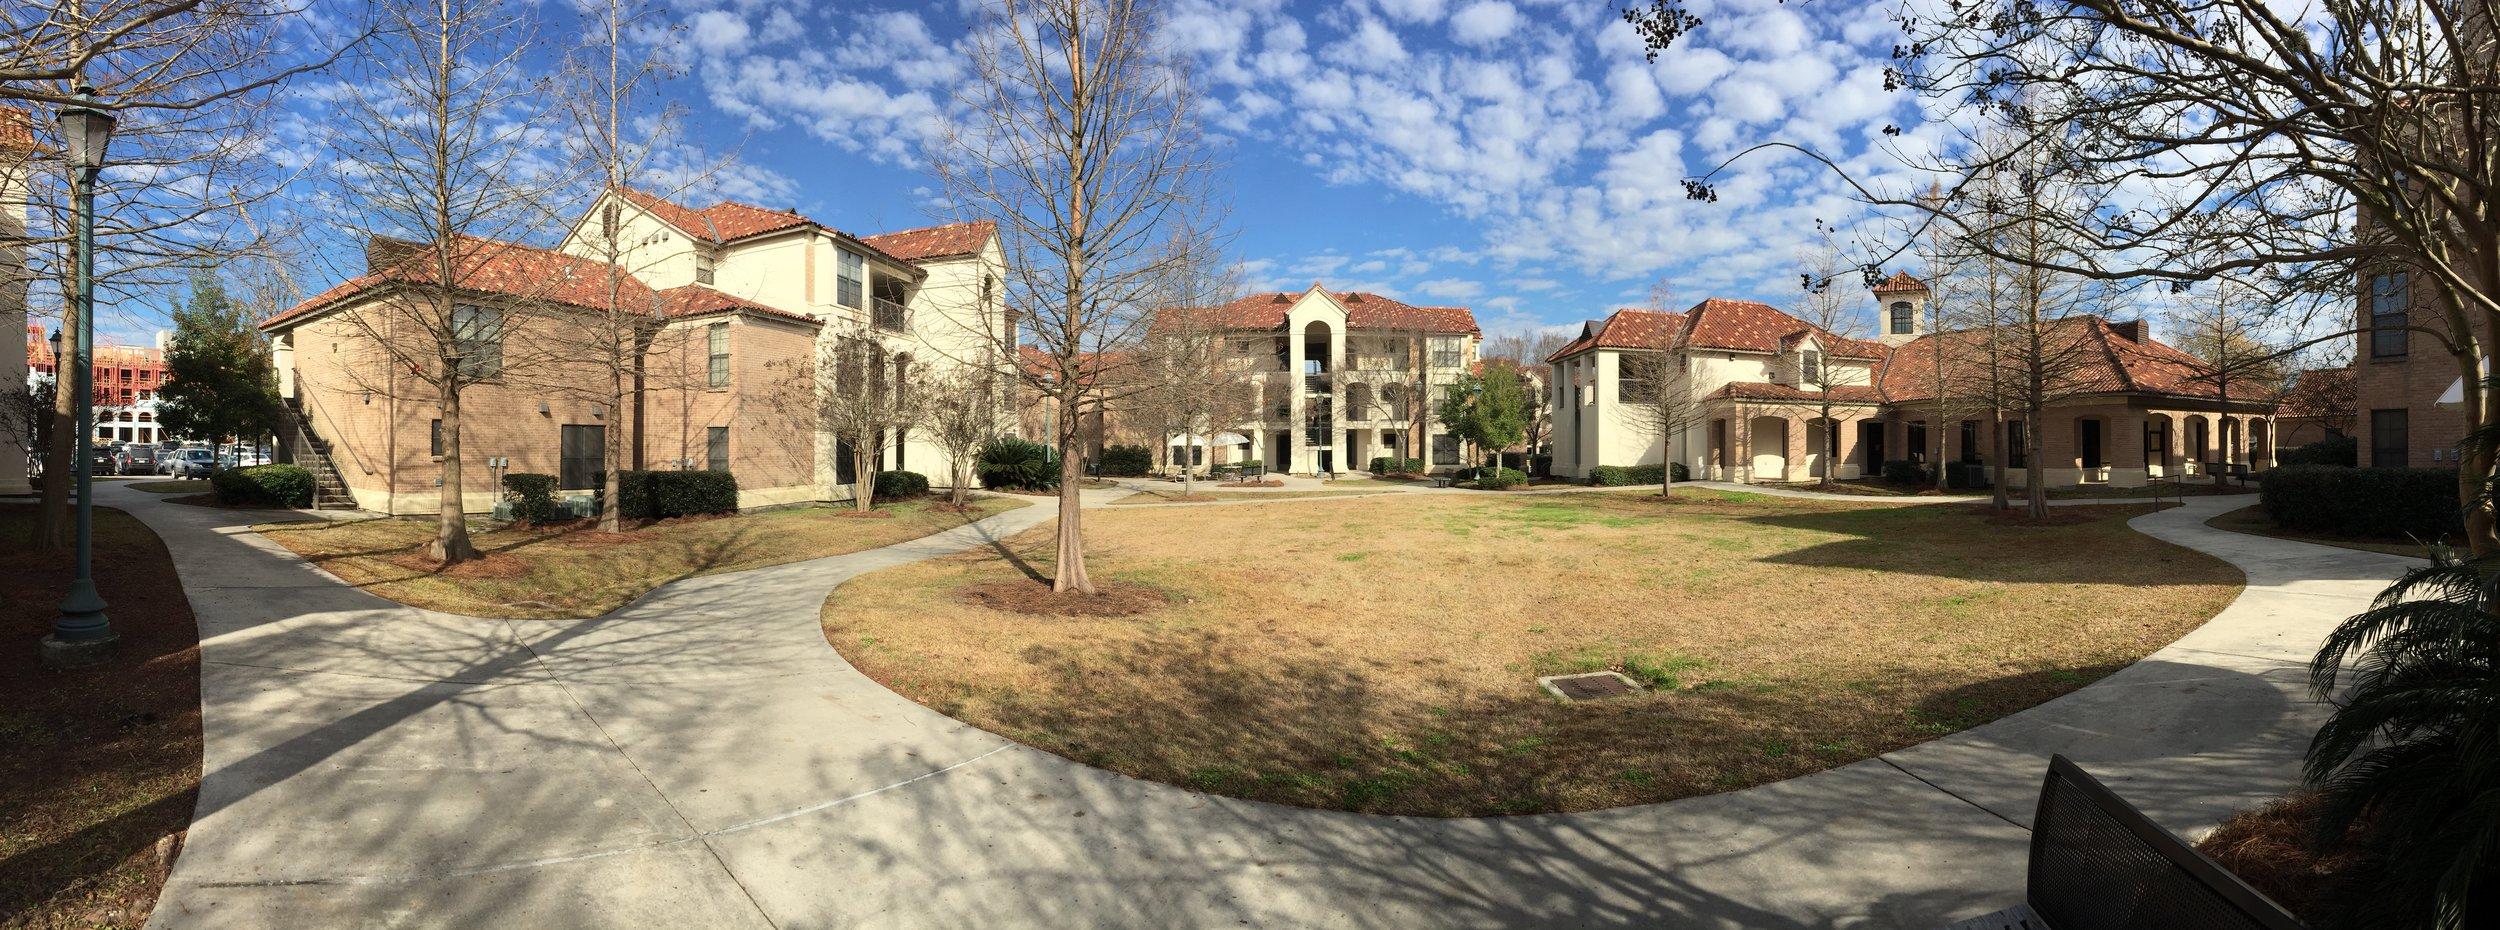 LSU West Campus Apartments